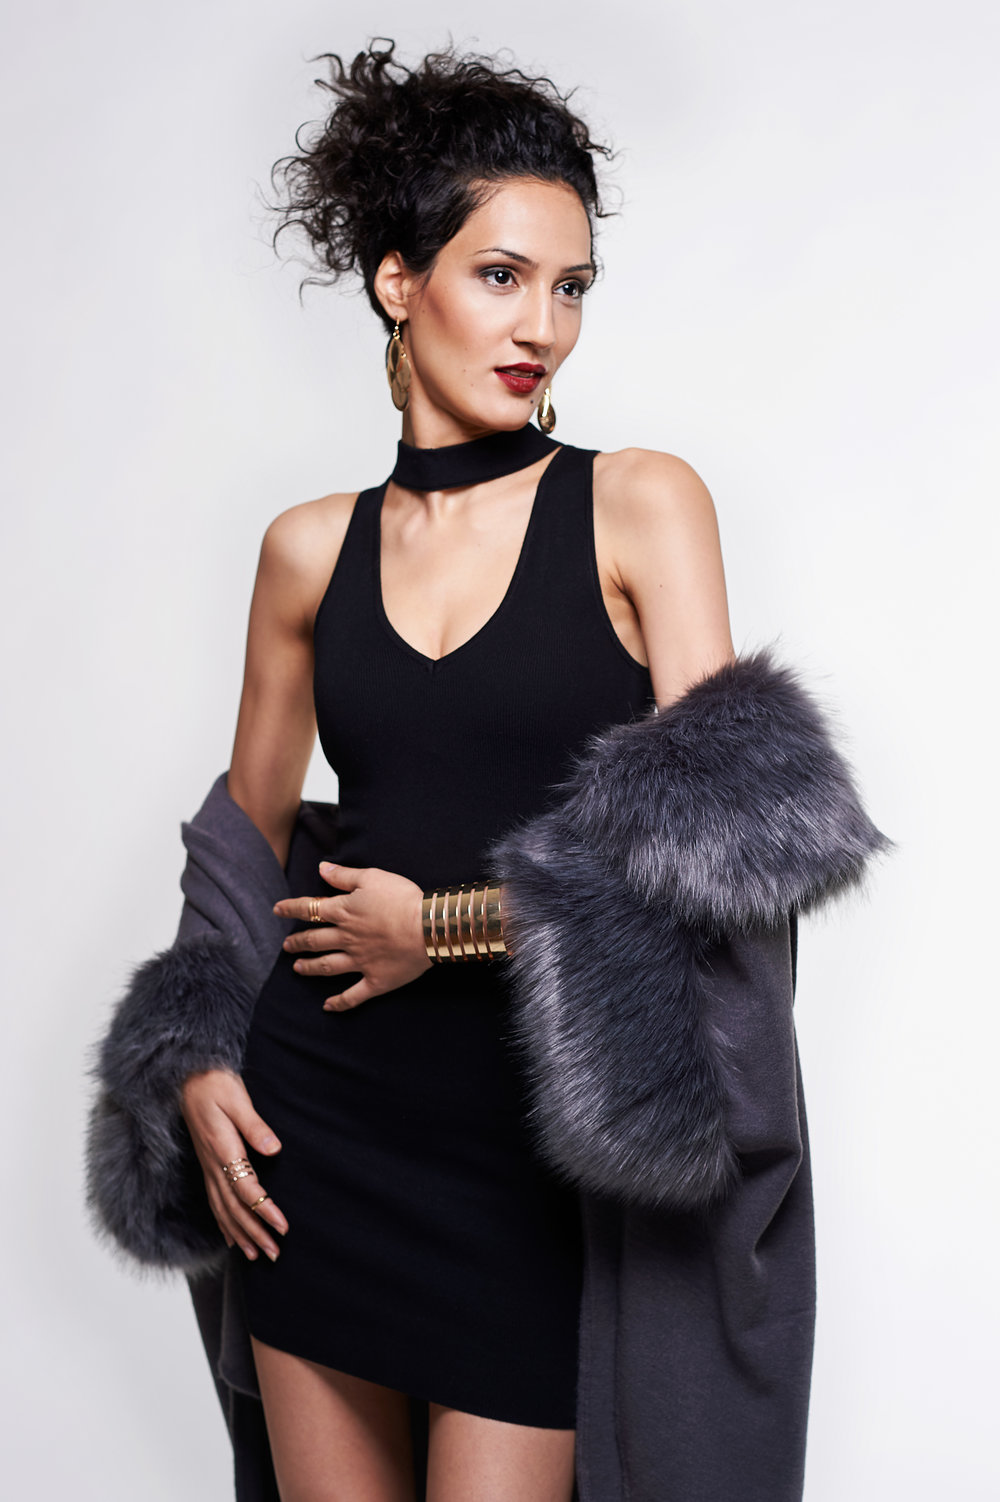 Marta-Hewson-Sahba-Derakhshan-modelshoot-17000.jpg